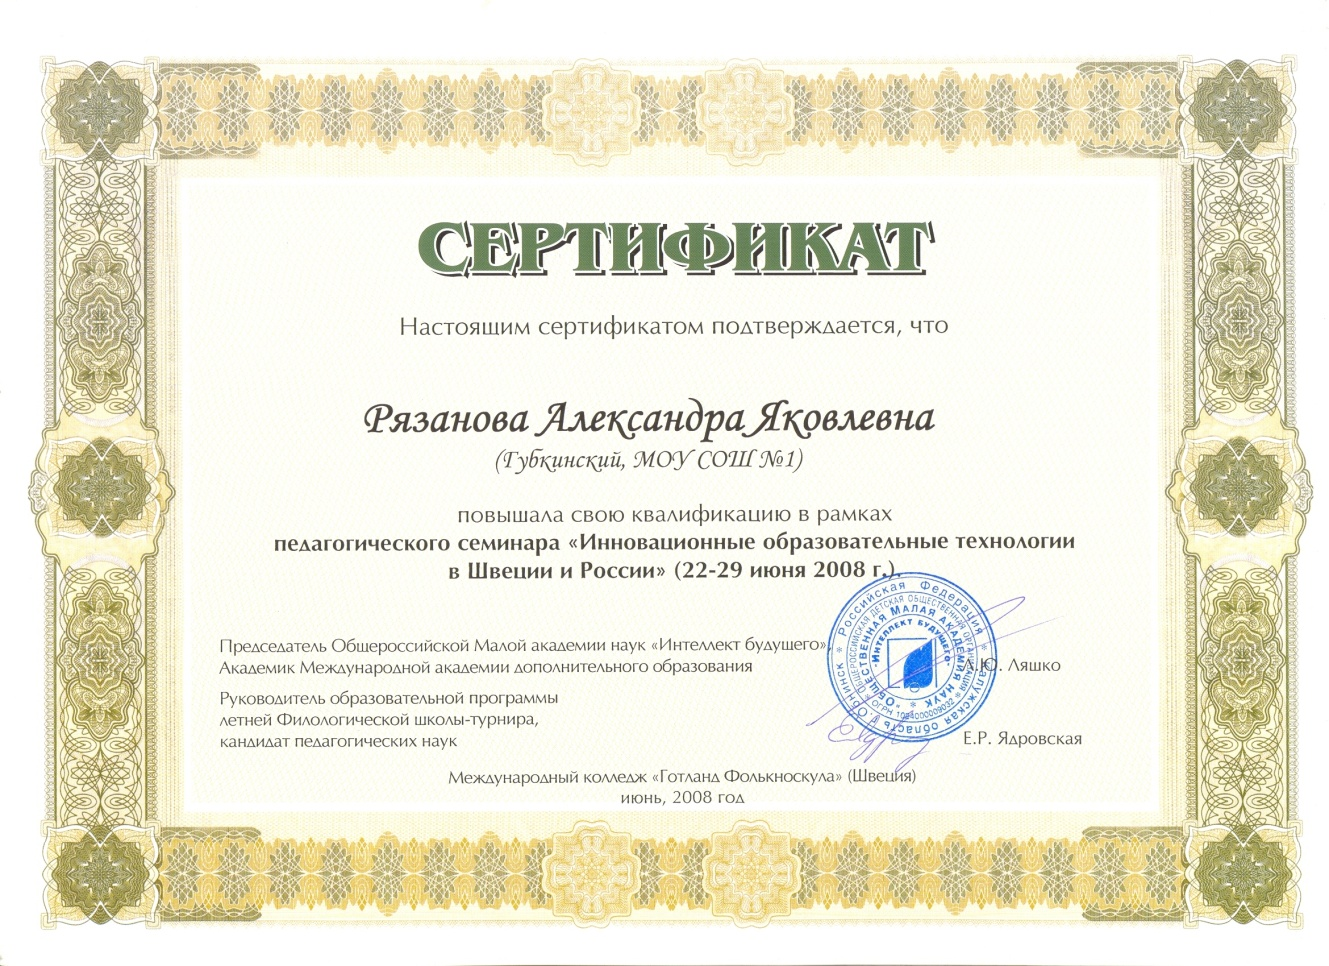 D:\Мои документы\Саша\Документы на грант 2009\Рязанова А.Я\2009-05 (май)\сканирование0047.jpg